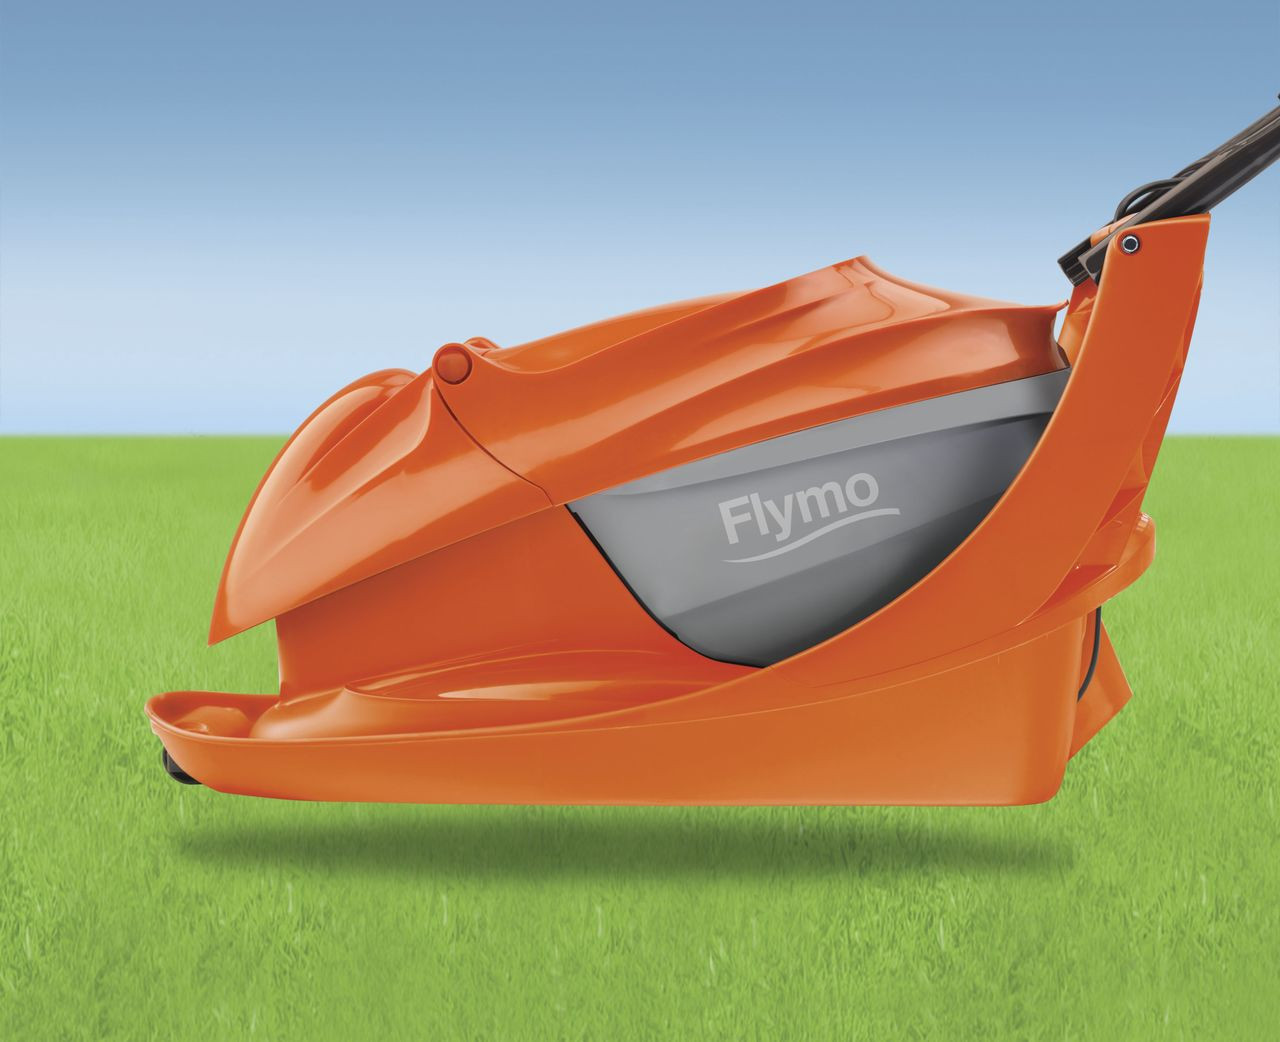 Flymo Hover Vac 280